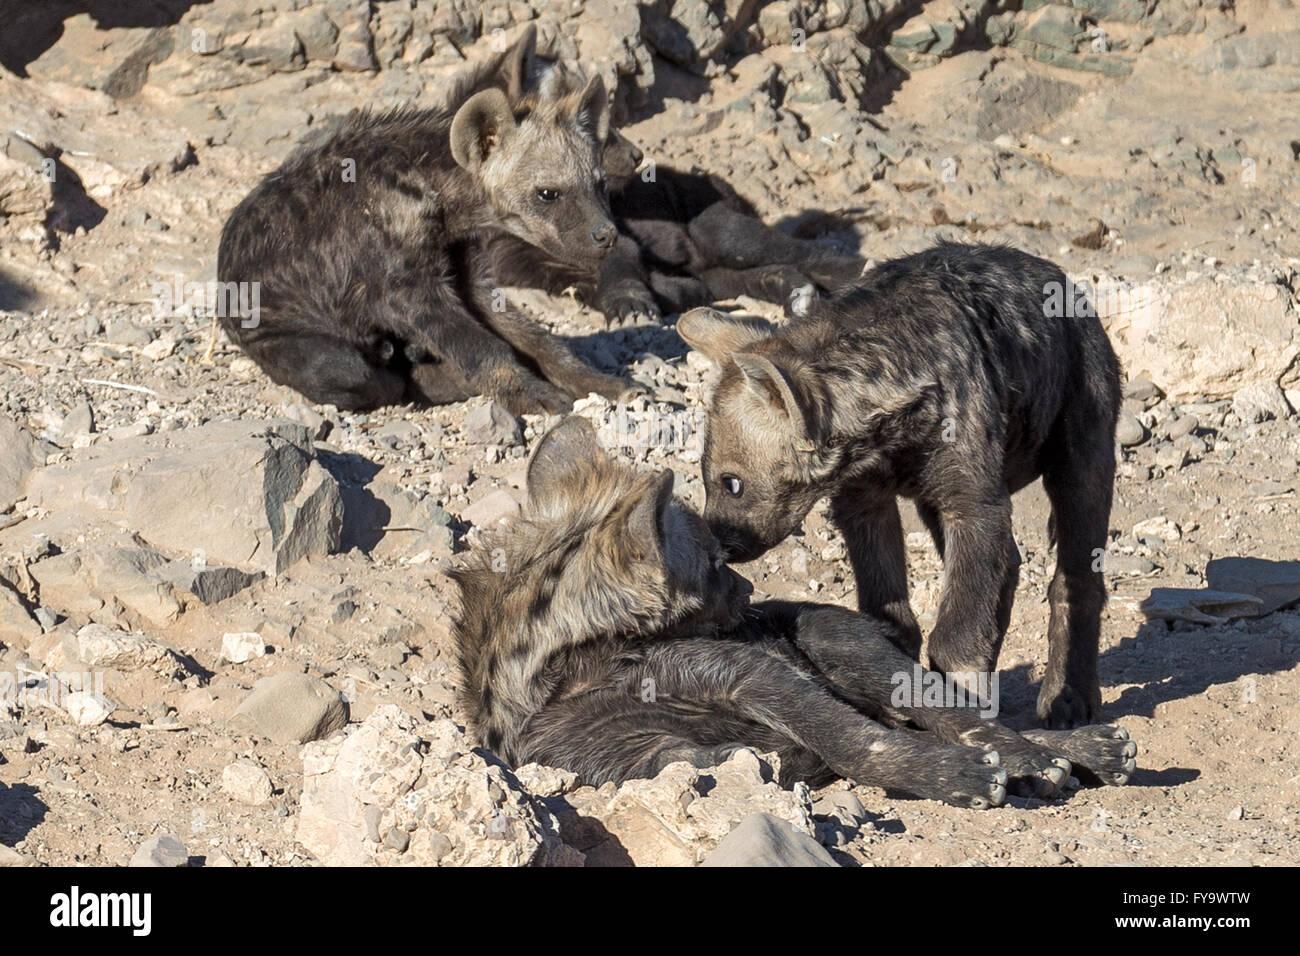 Spotted Hyena den juveniles Damaraland Namibia - Stock Image